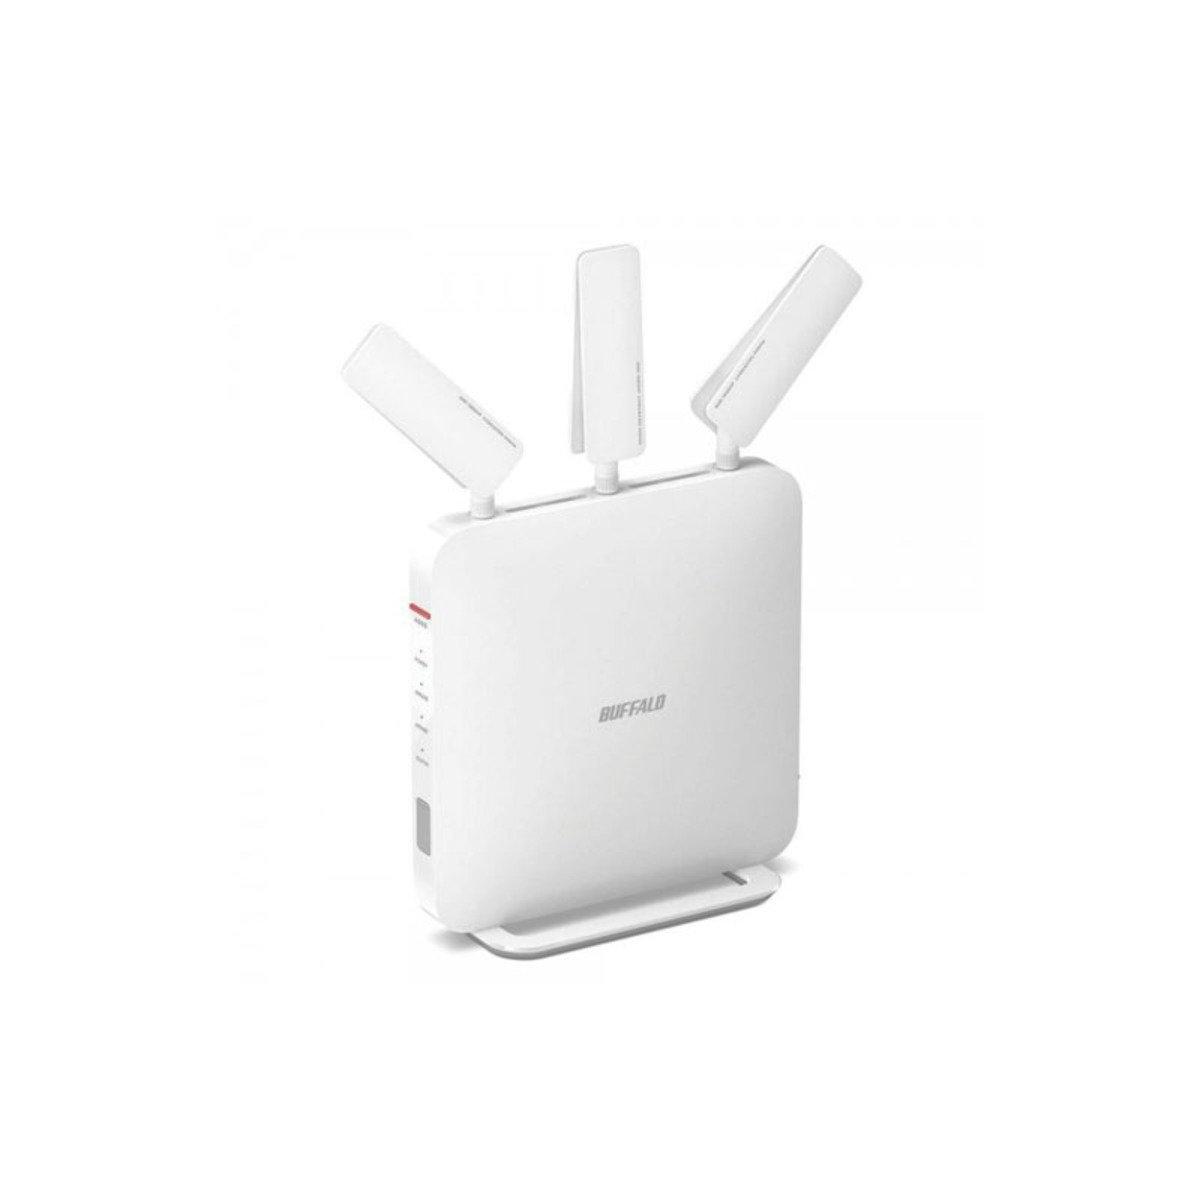 AC1900 雙頻無線高增益天線路由器 WXR-1900DHP